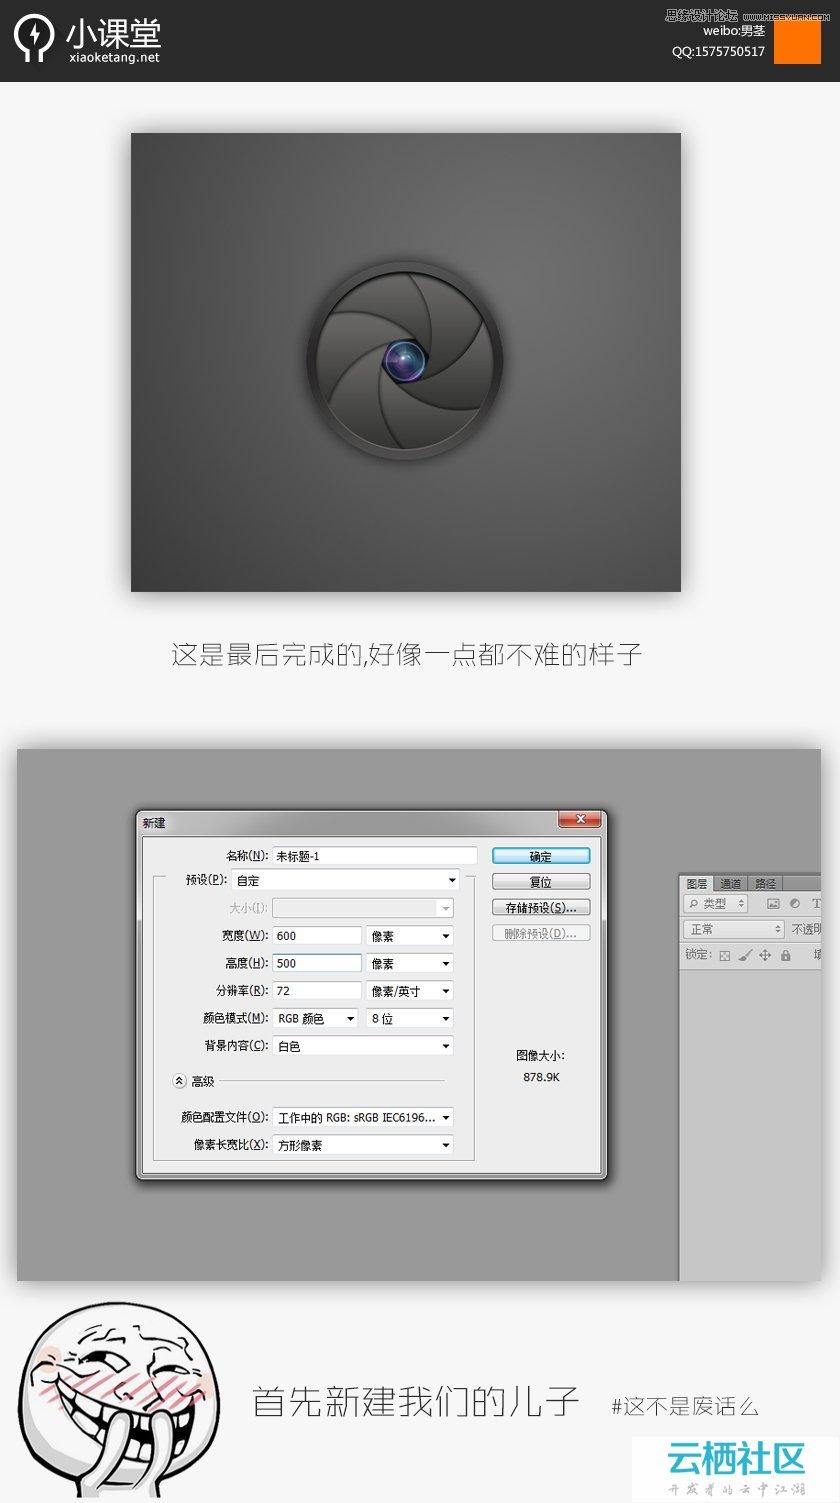 Photoshop绘制立体风格的快门镜头图标-photoshop绘制图形